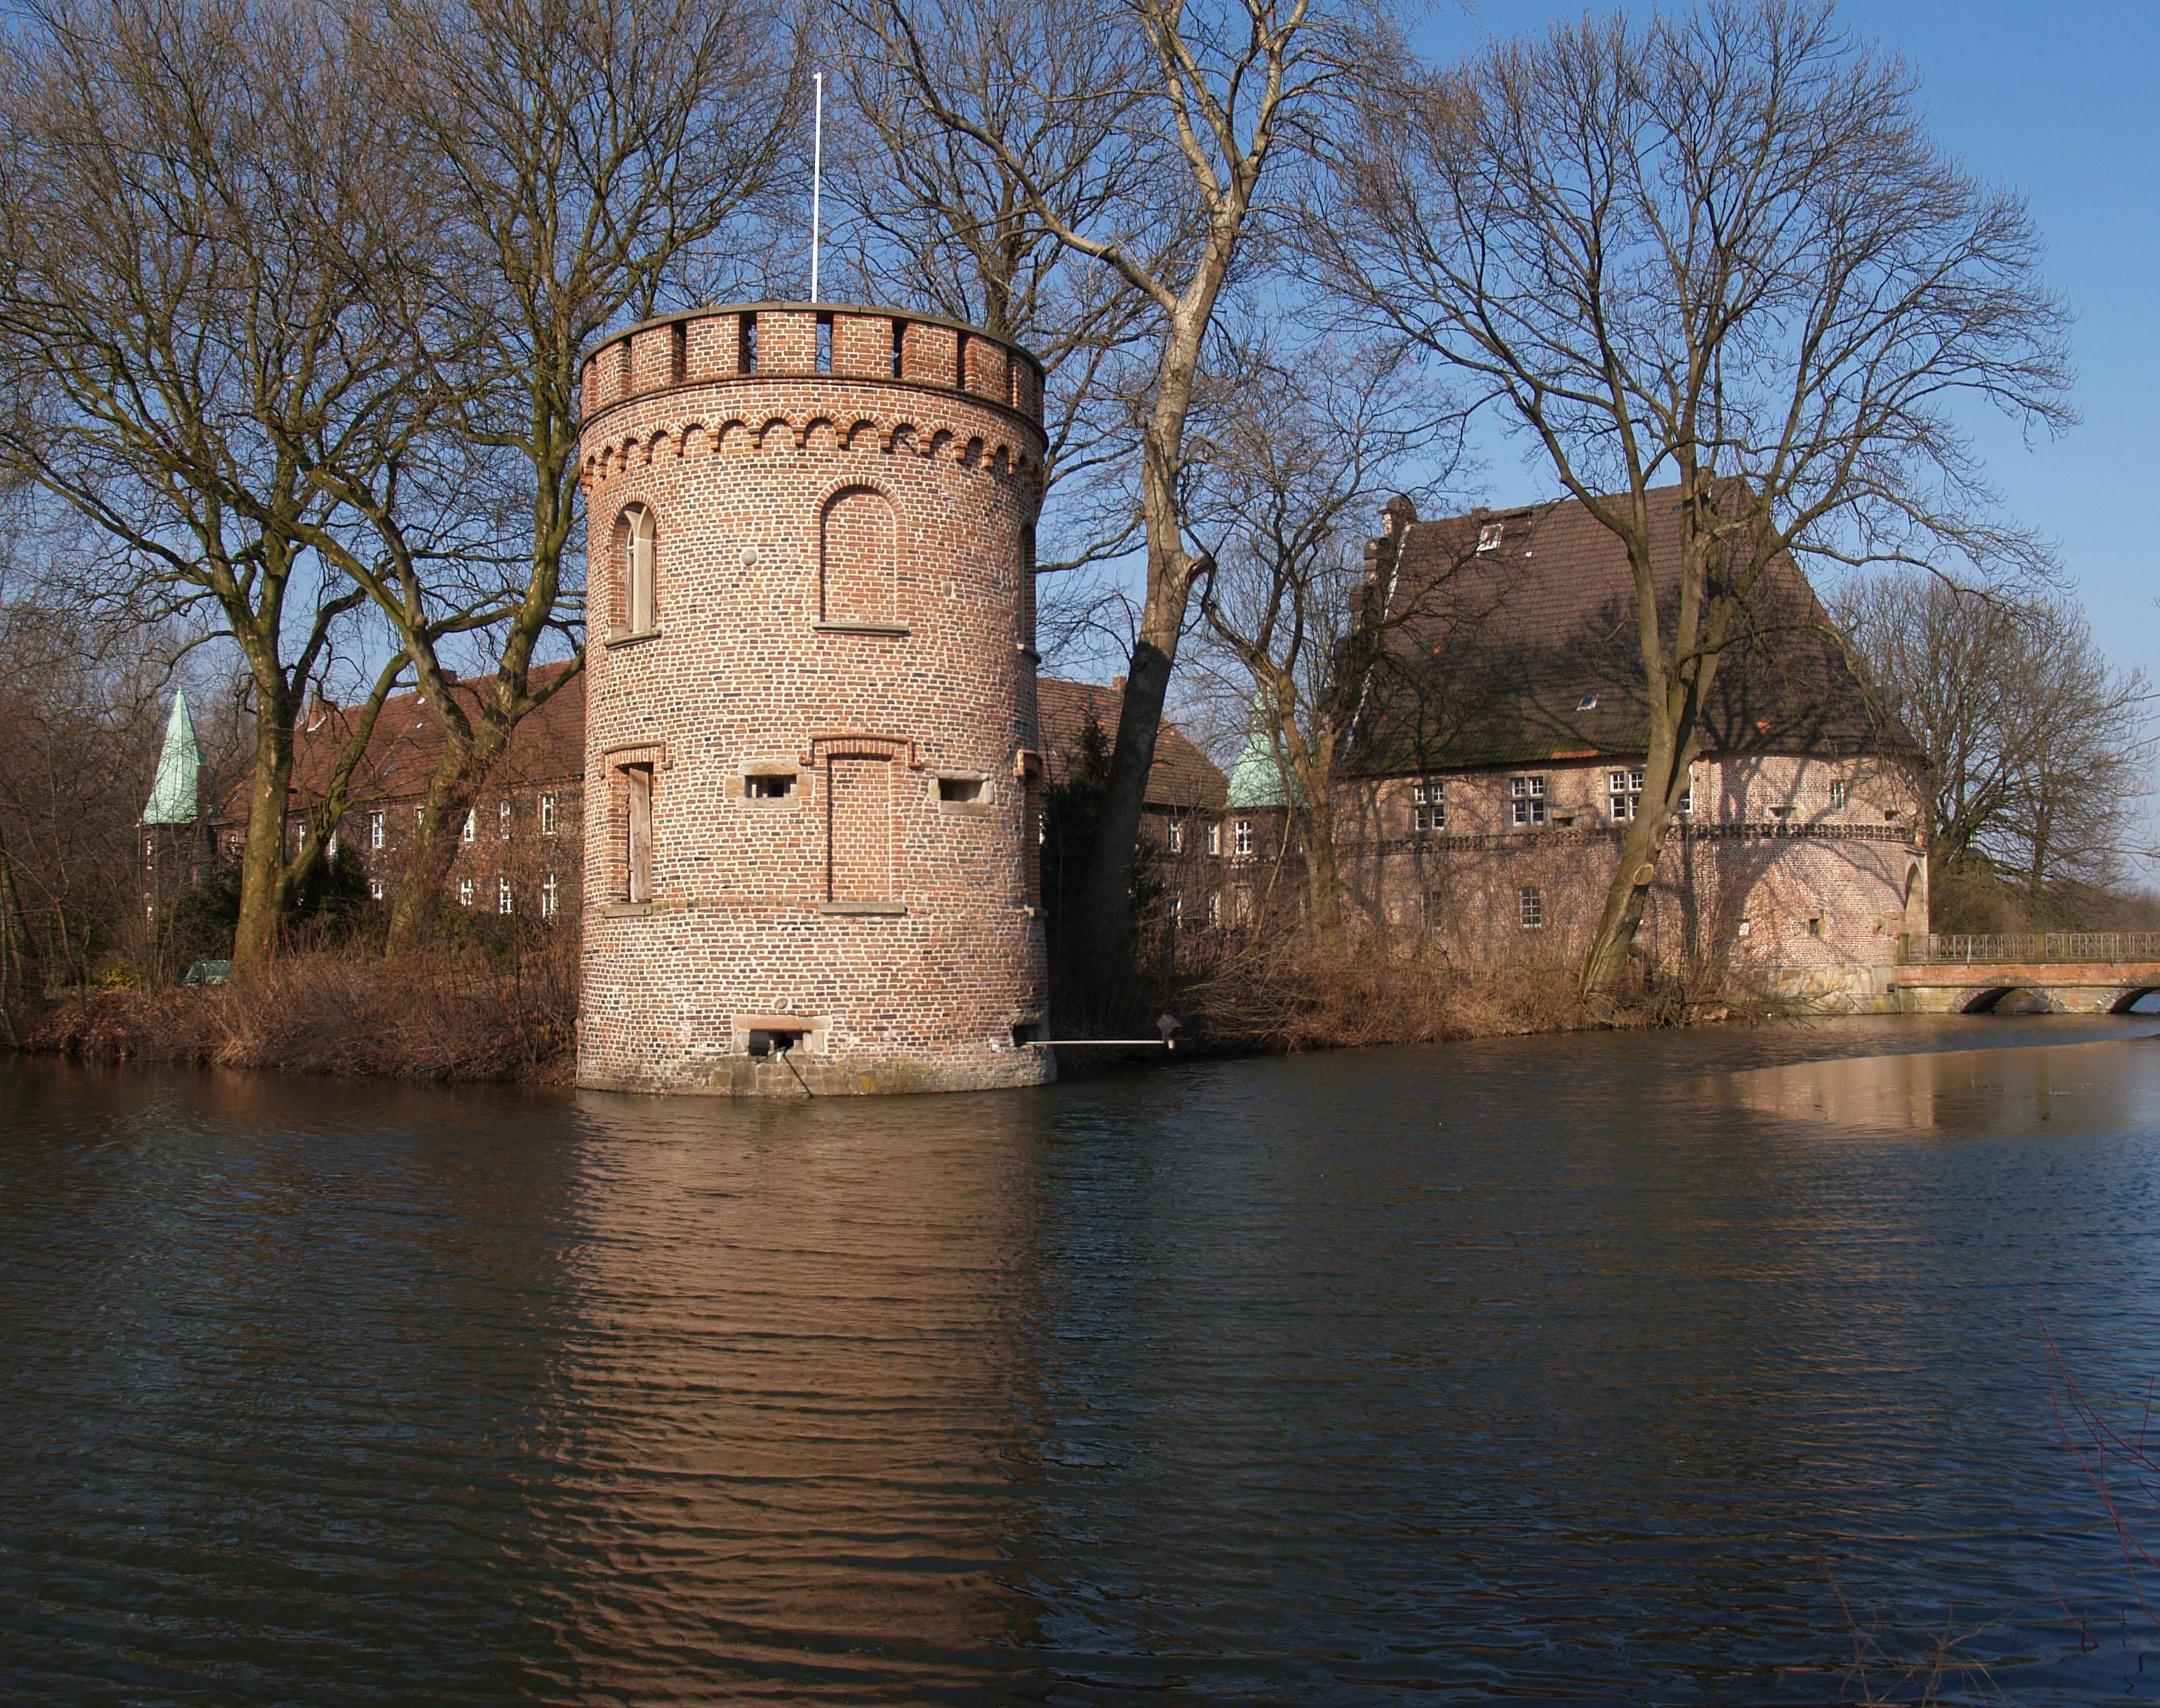 Castrop-Rauxel Germany  city photos gallery : Schloss Bladenhorst, Castrop Rauxel